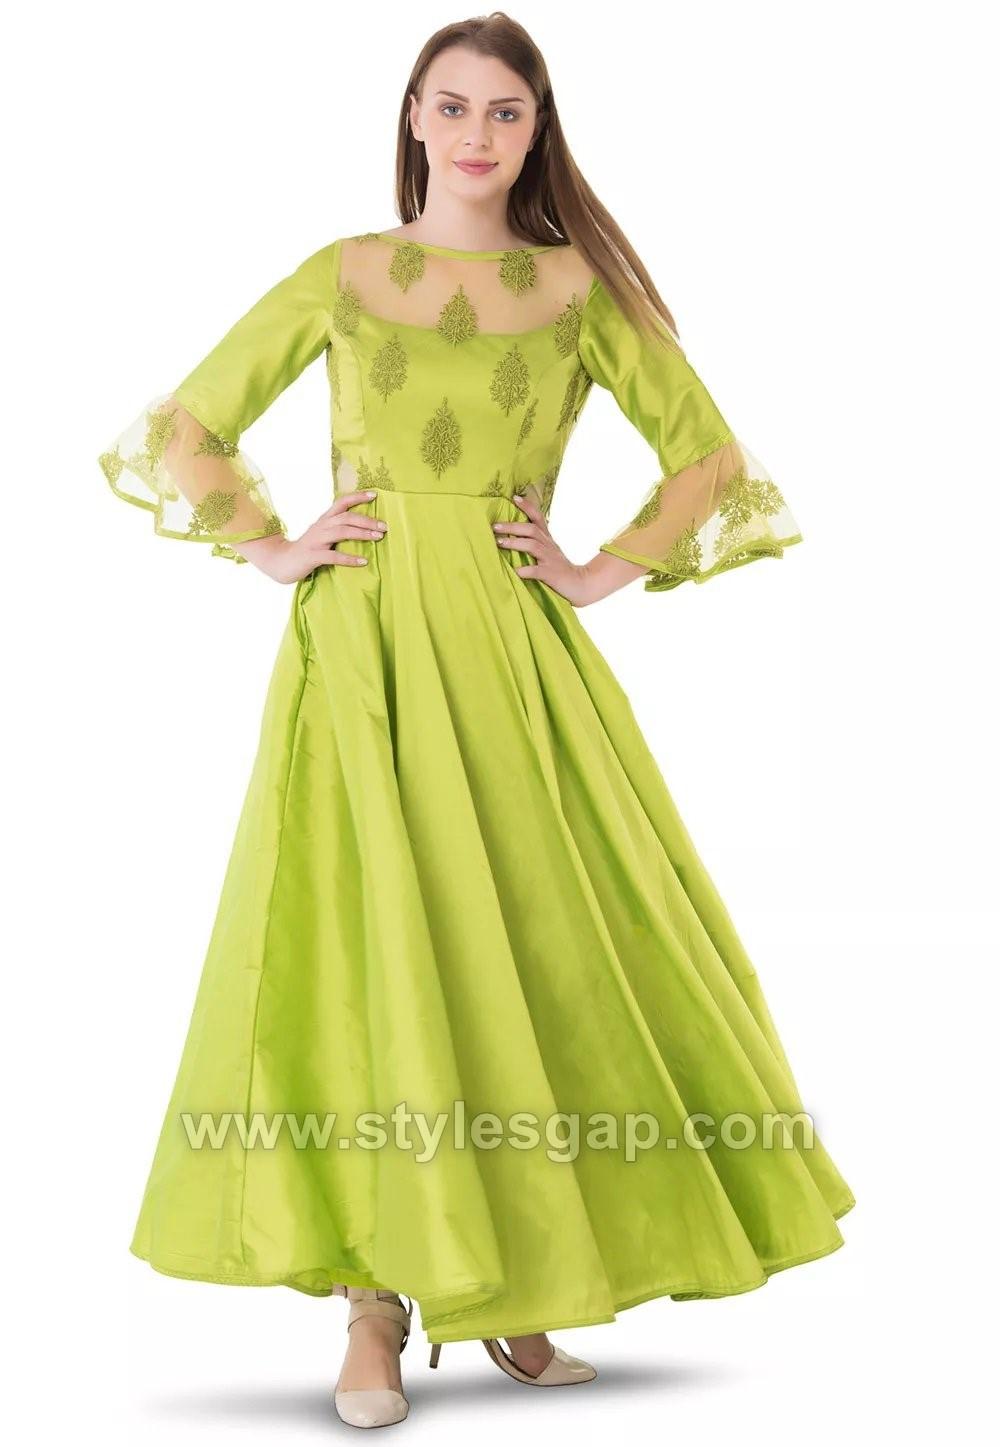 Umbrella Cut Dress Designs  Frocks Styles 201819 Collection